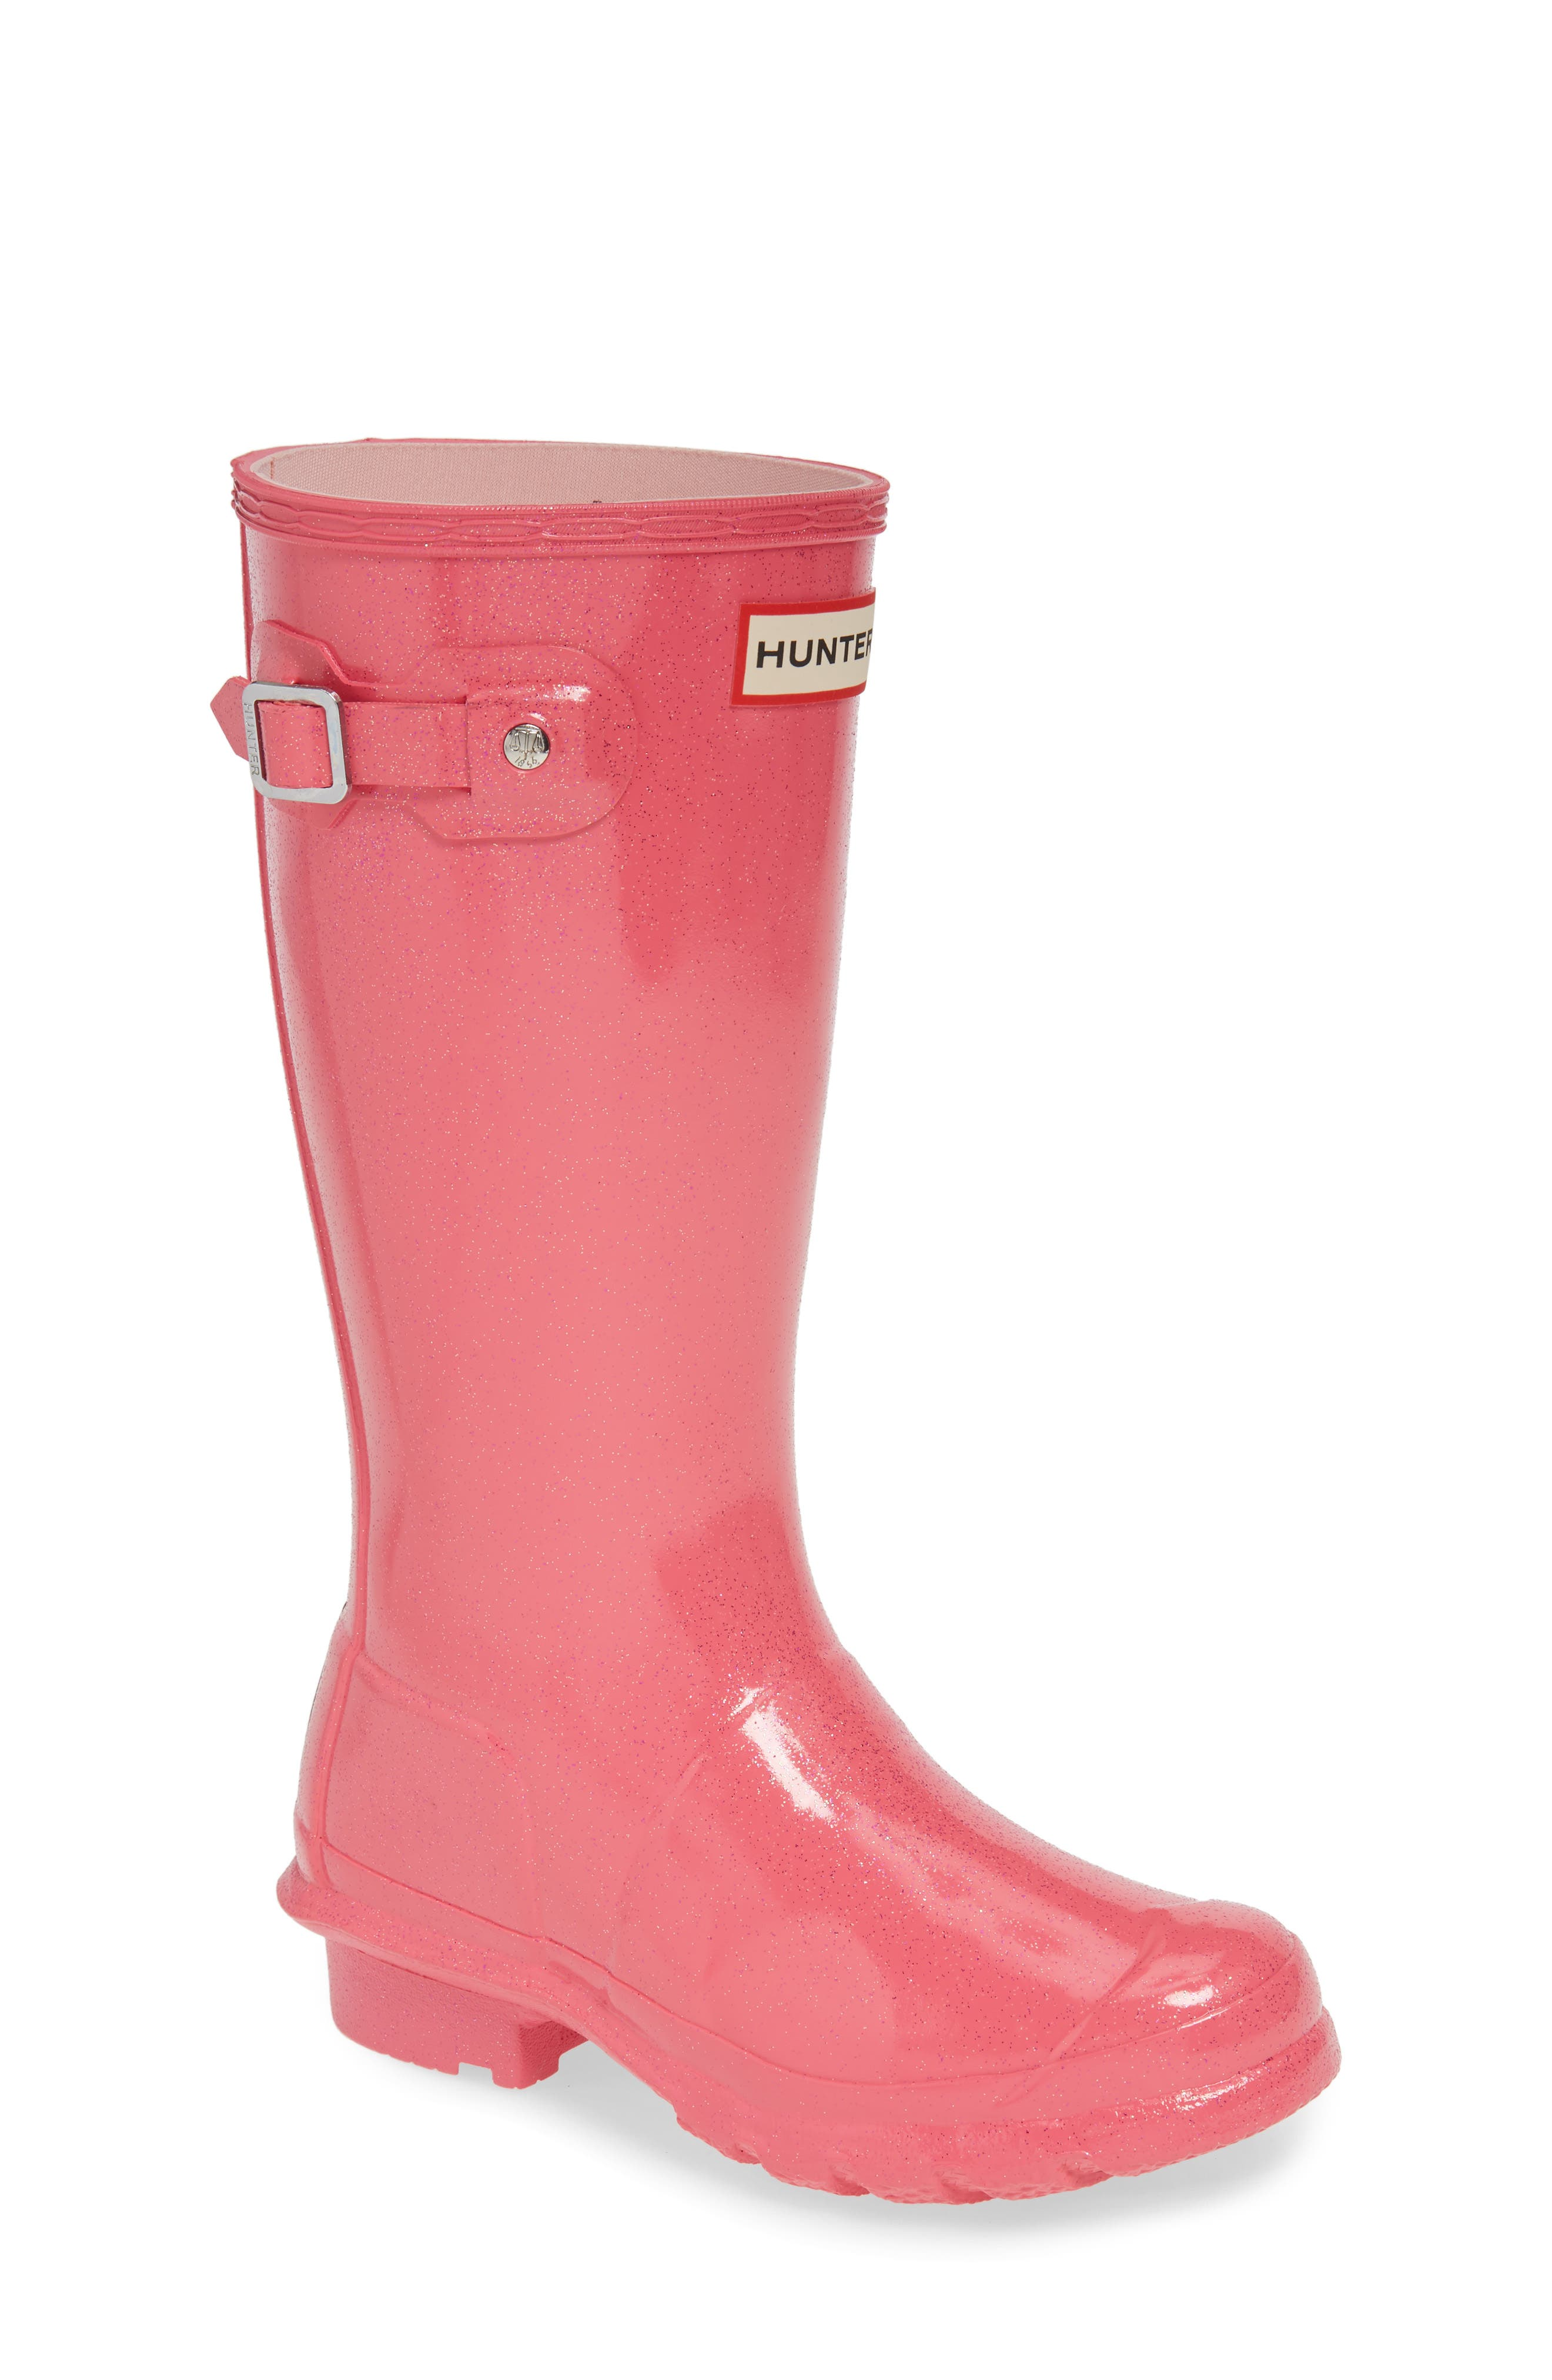 HUNTER Starcloud Glitter Rain Boot, Main, color, ARCADE PINK